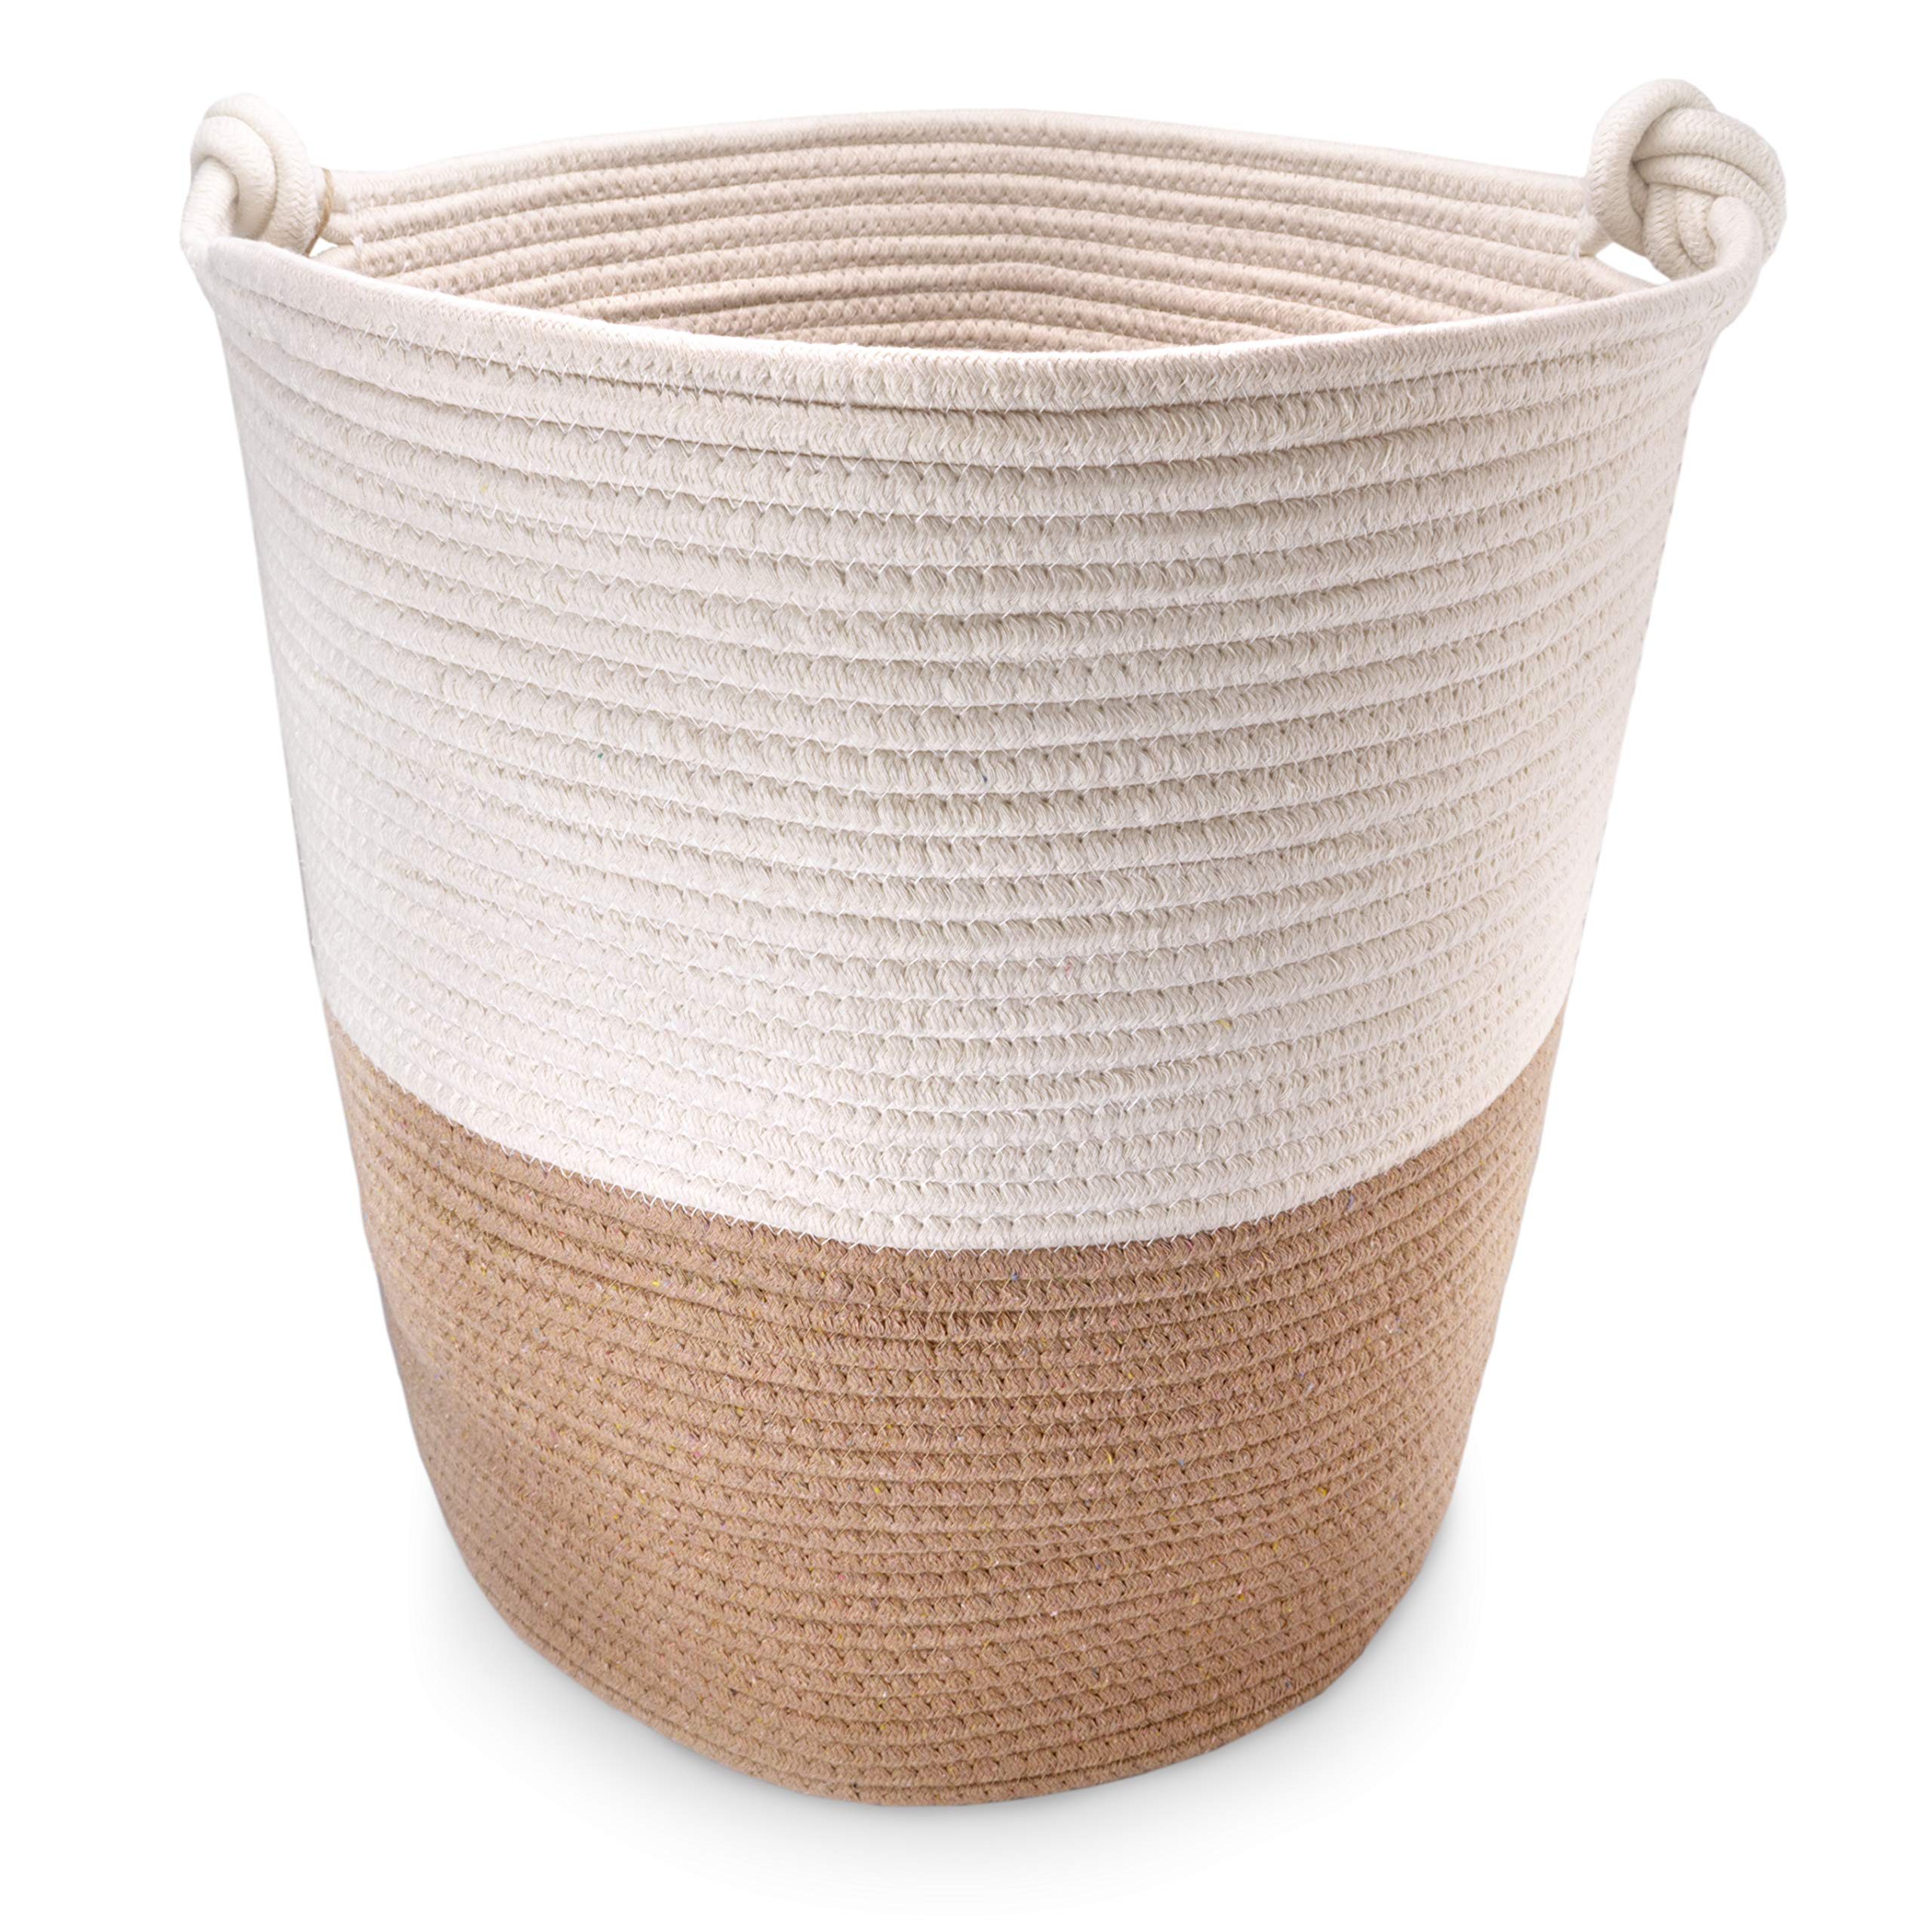 Large Cotton Rope Storage Baskets | Laundry | Woven | 18''x16'' | Blanket Holder with Handles | Baby Hamper | Toy Bin | Round Decorative Organizer | for Shoe Closet | Nursery | Living Room | Shelf by Alden & Obi